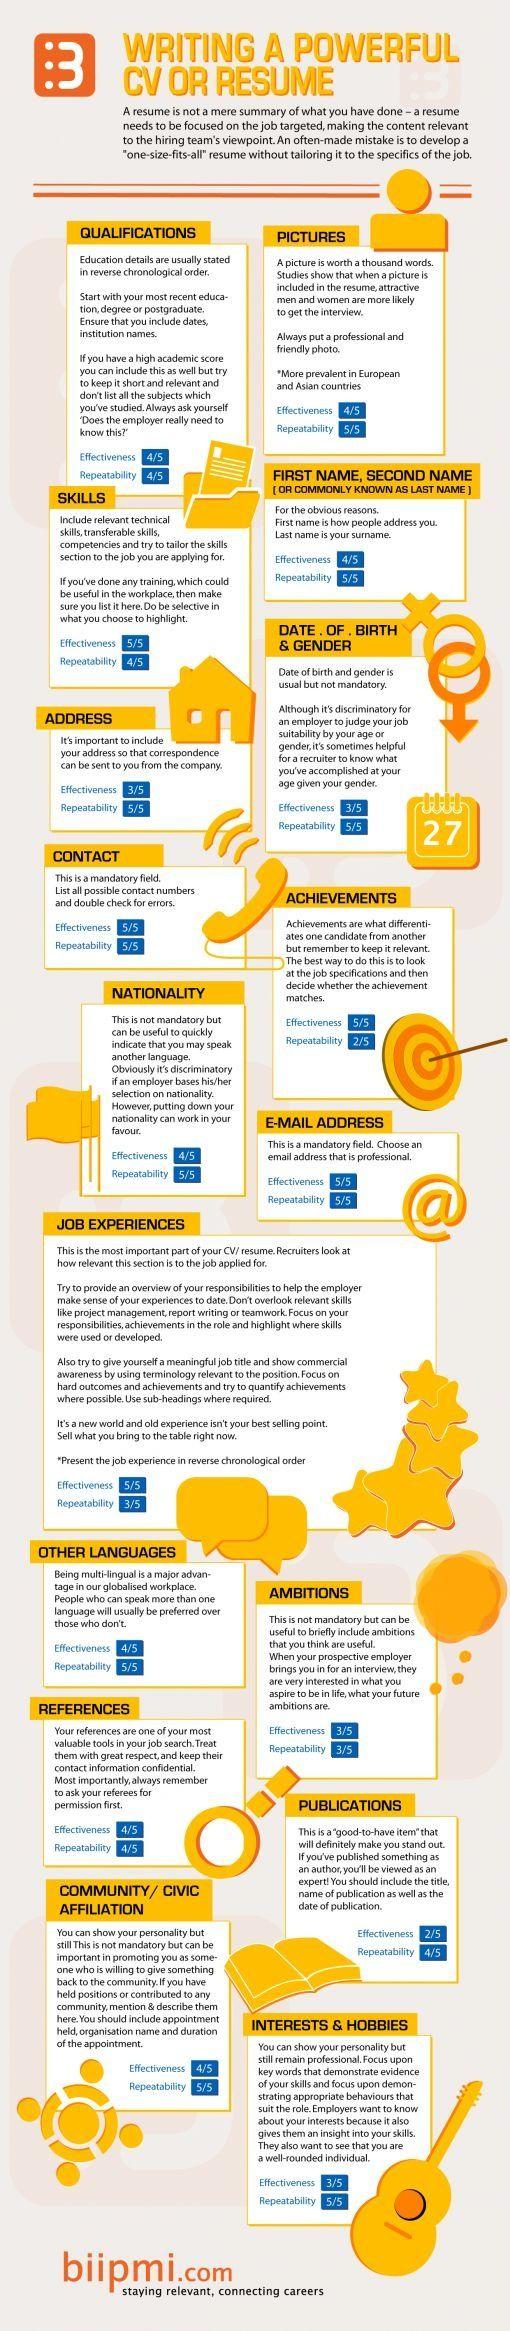 format for resume writing - Formatting Resume